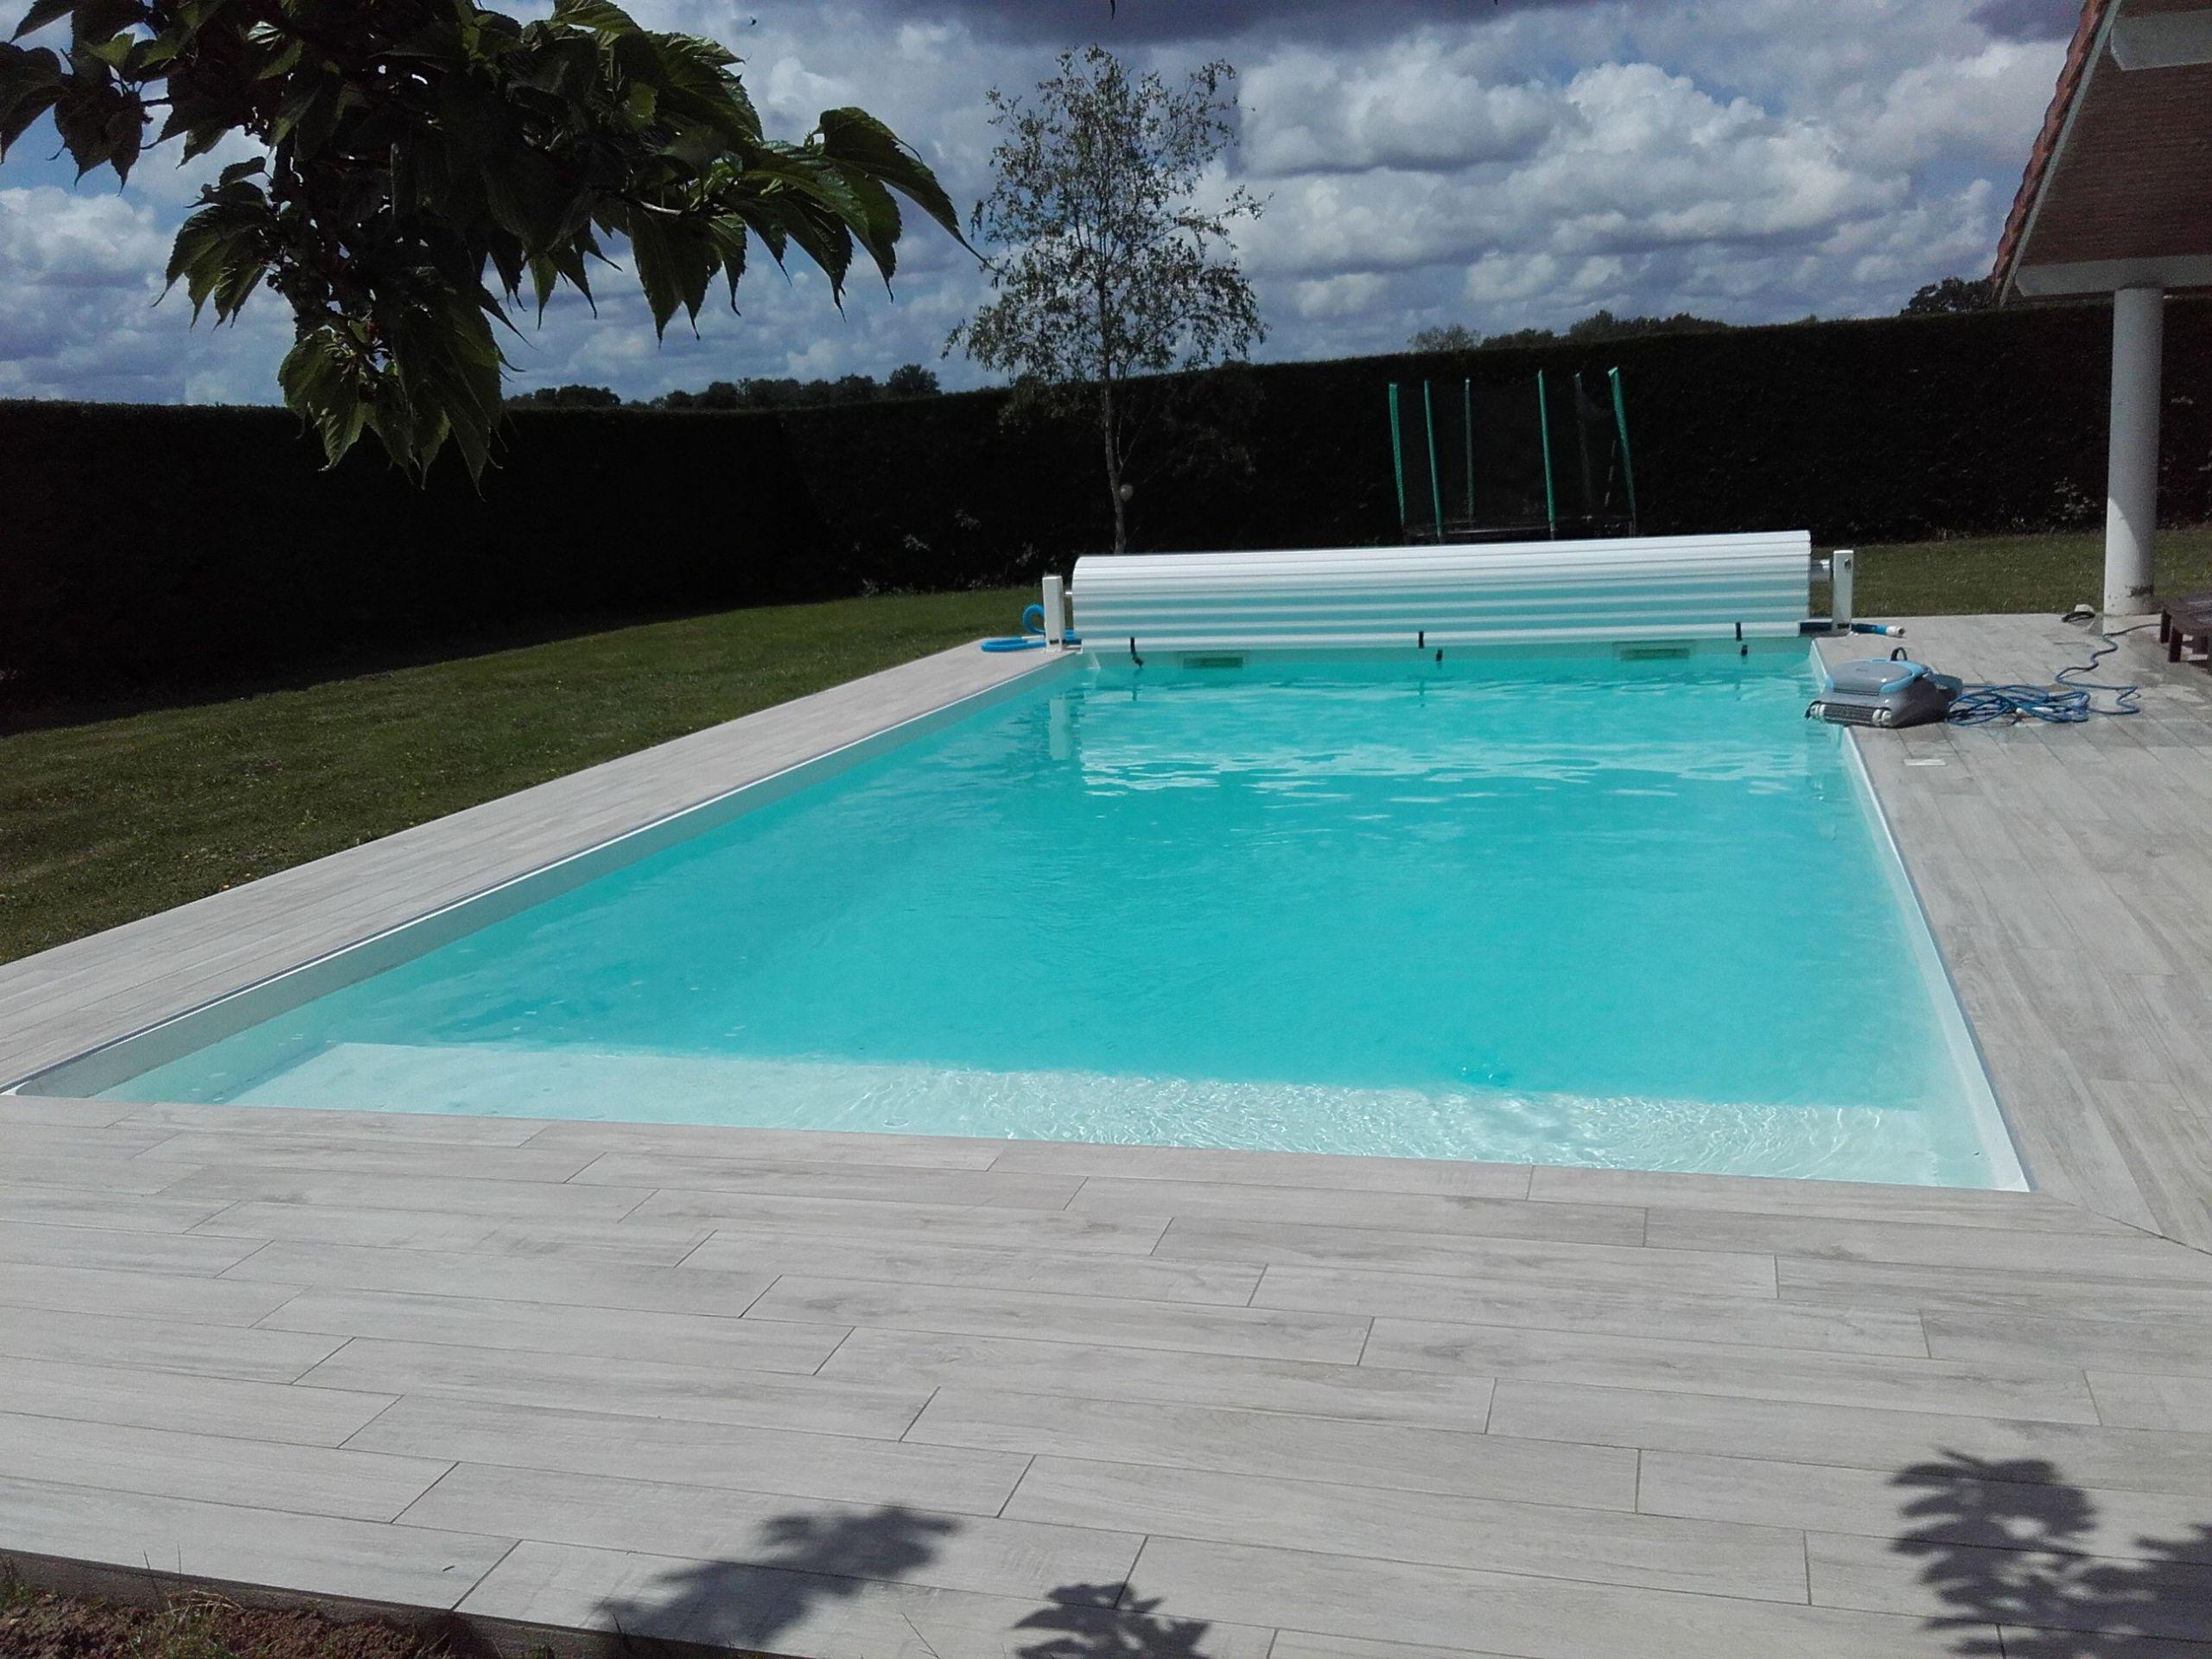 prix piscine coque mont de marsan Les Piscines du Net